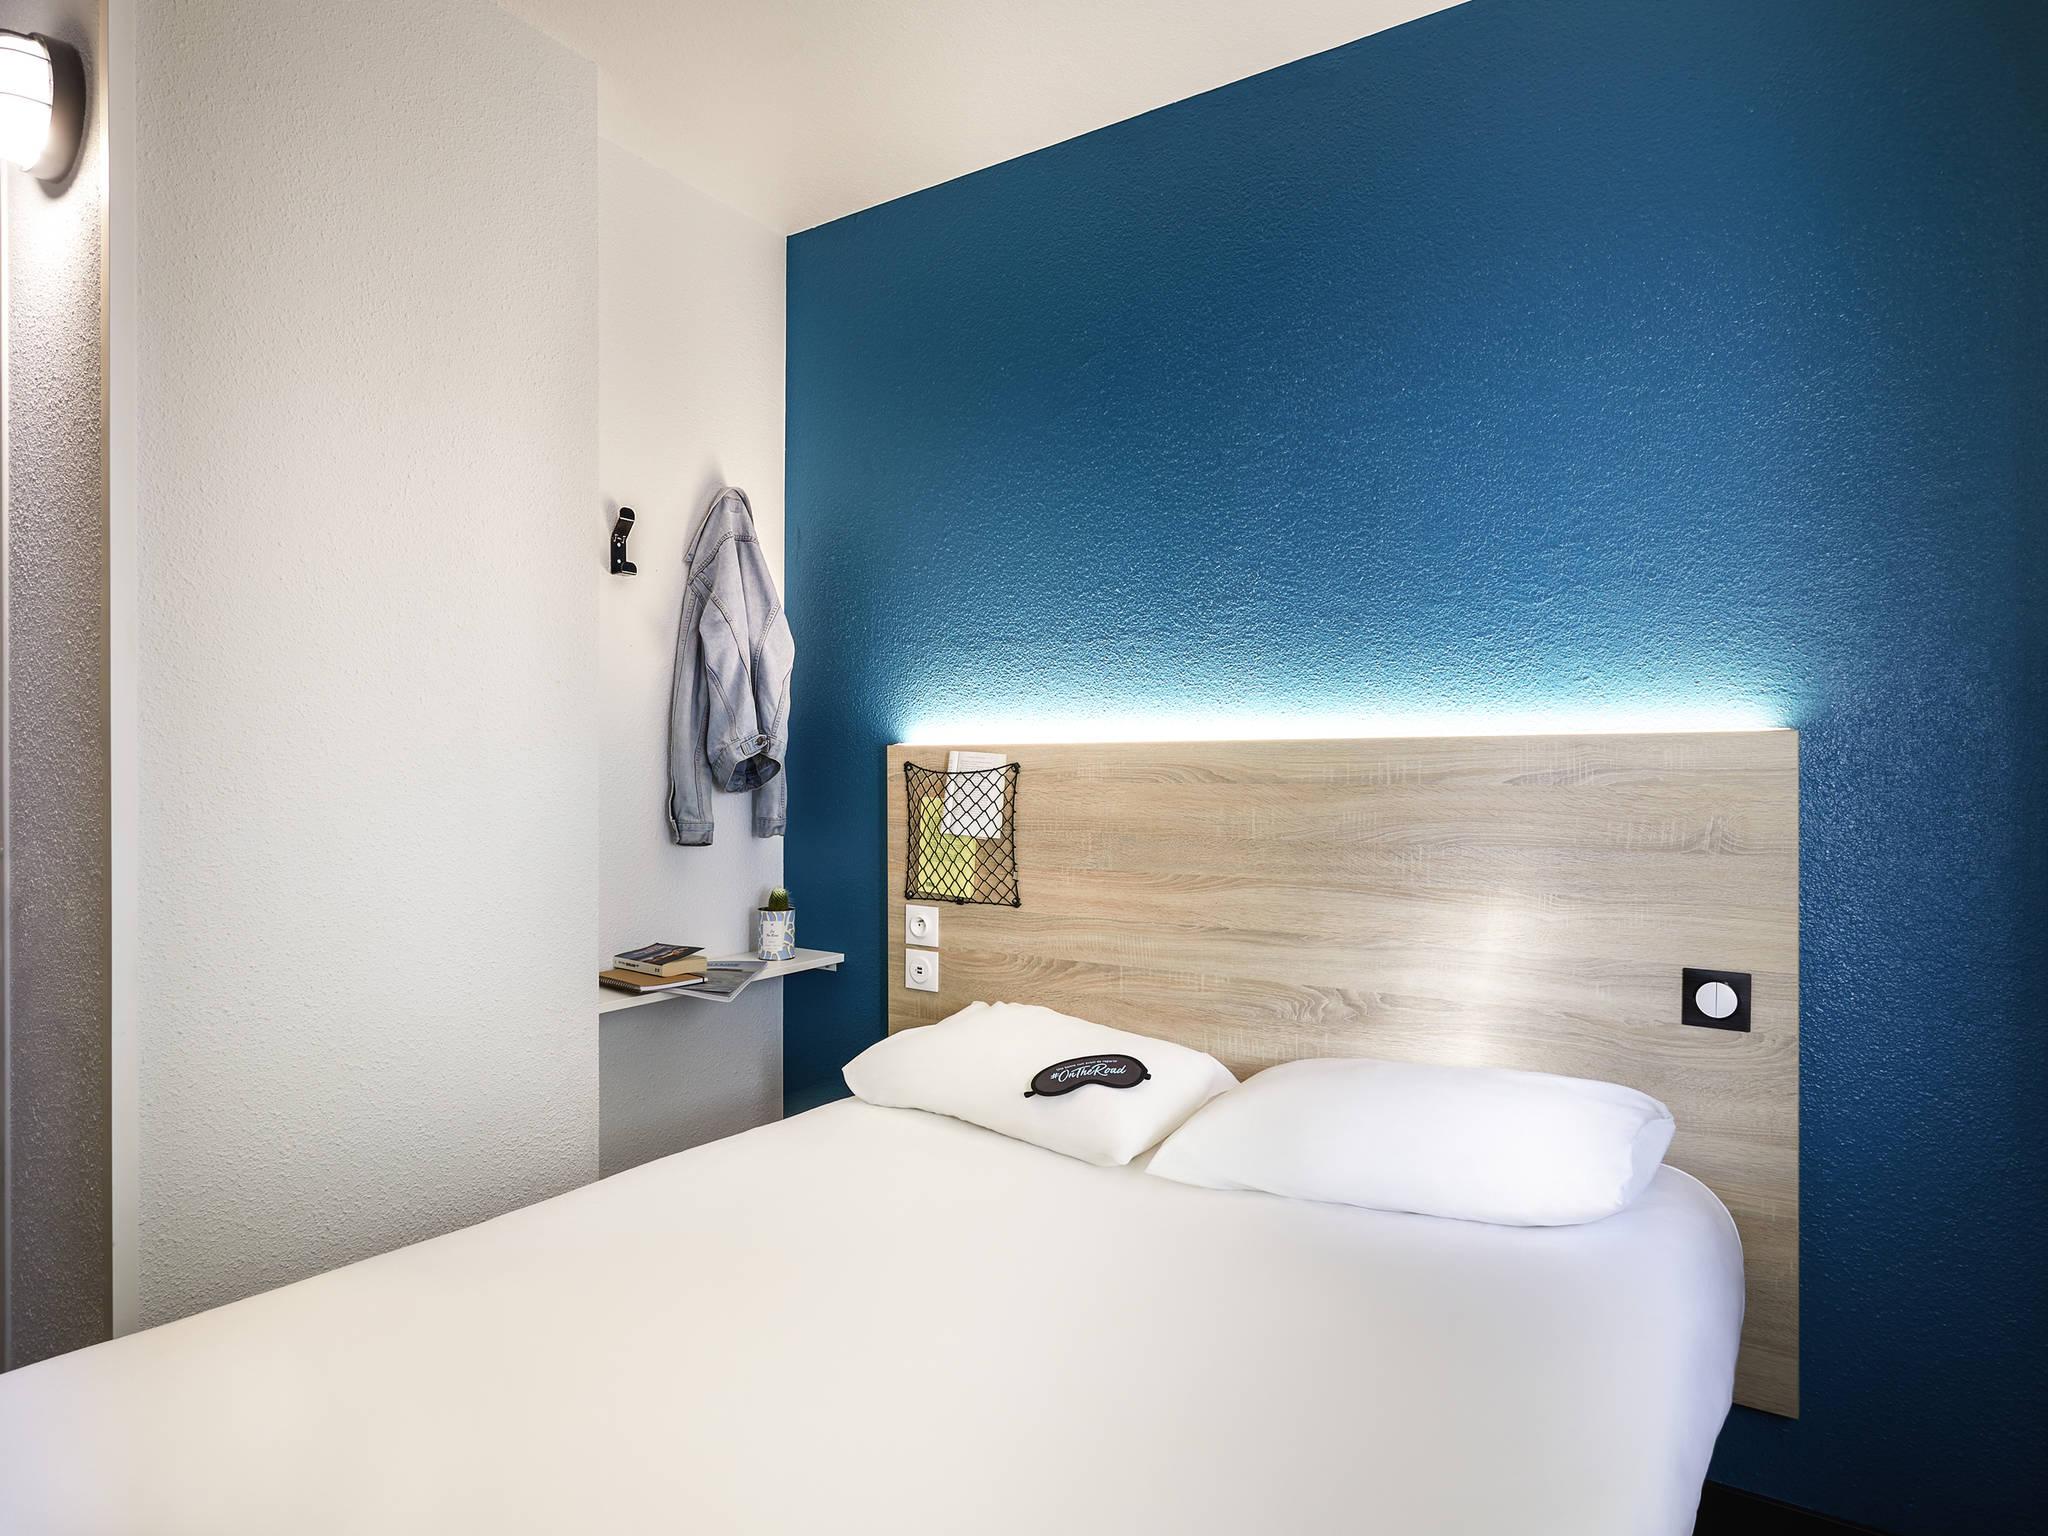 ホテル – hotelF1 Nîmes Ouest